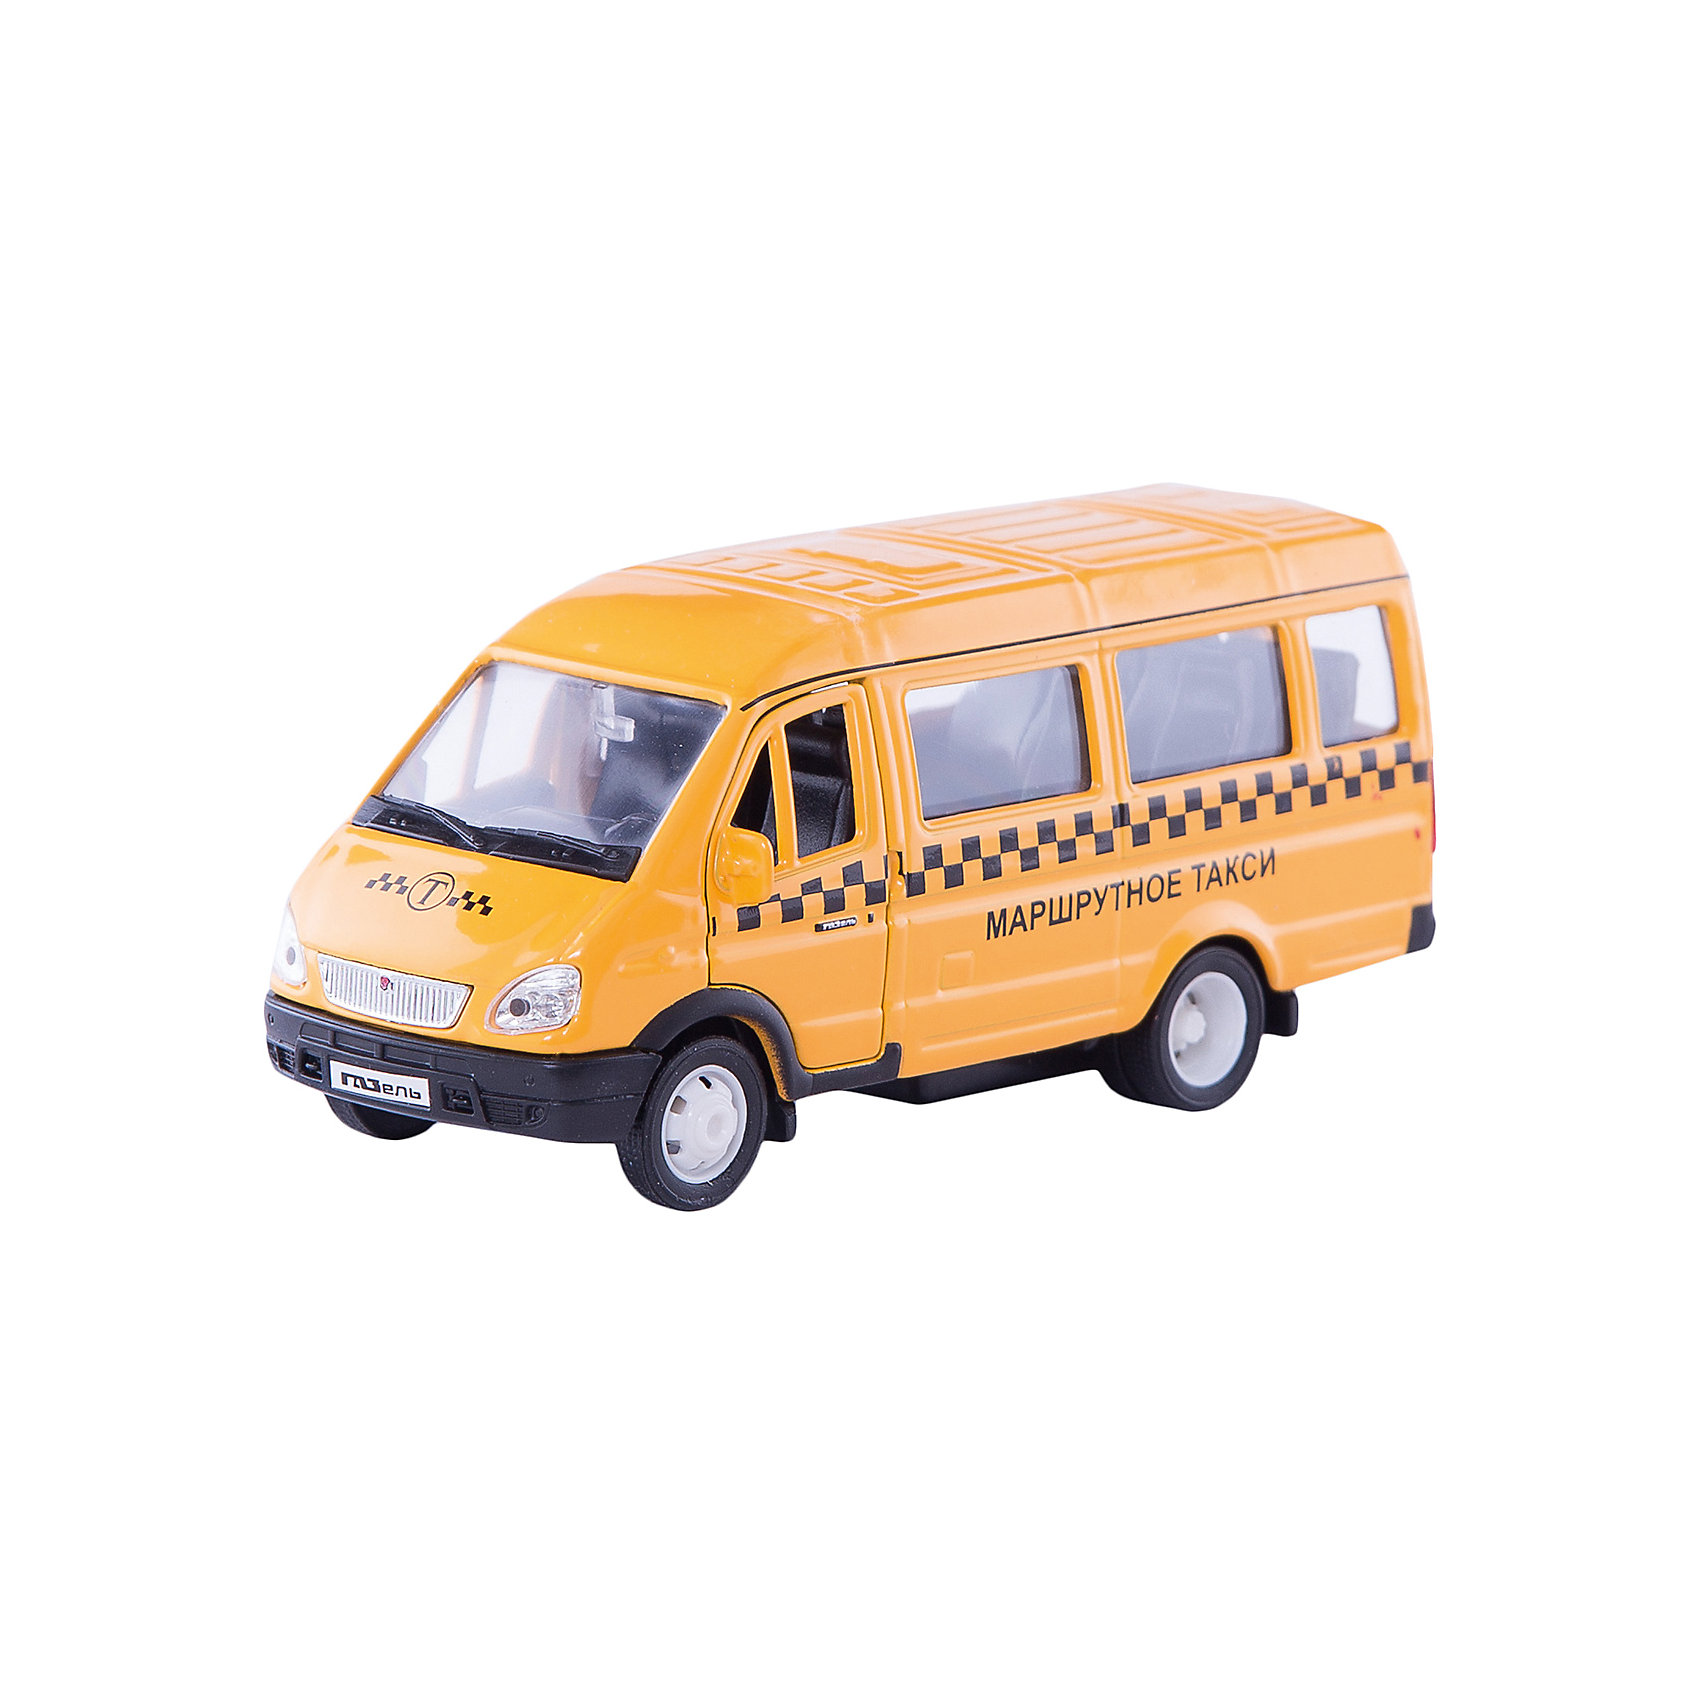 Welly Welly Модель машины ГАЗель Такси машинки welly игрушка модель машины автокран